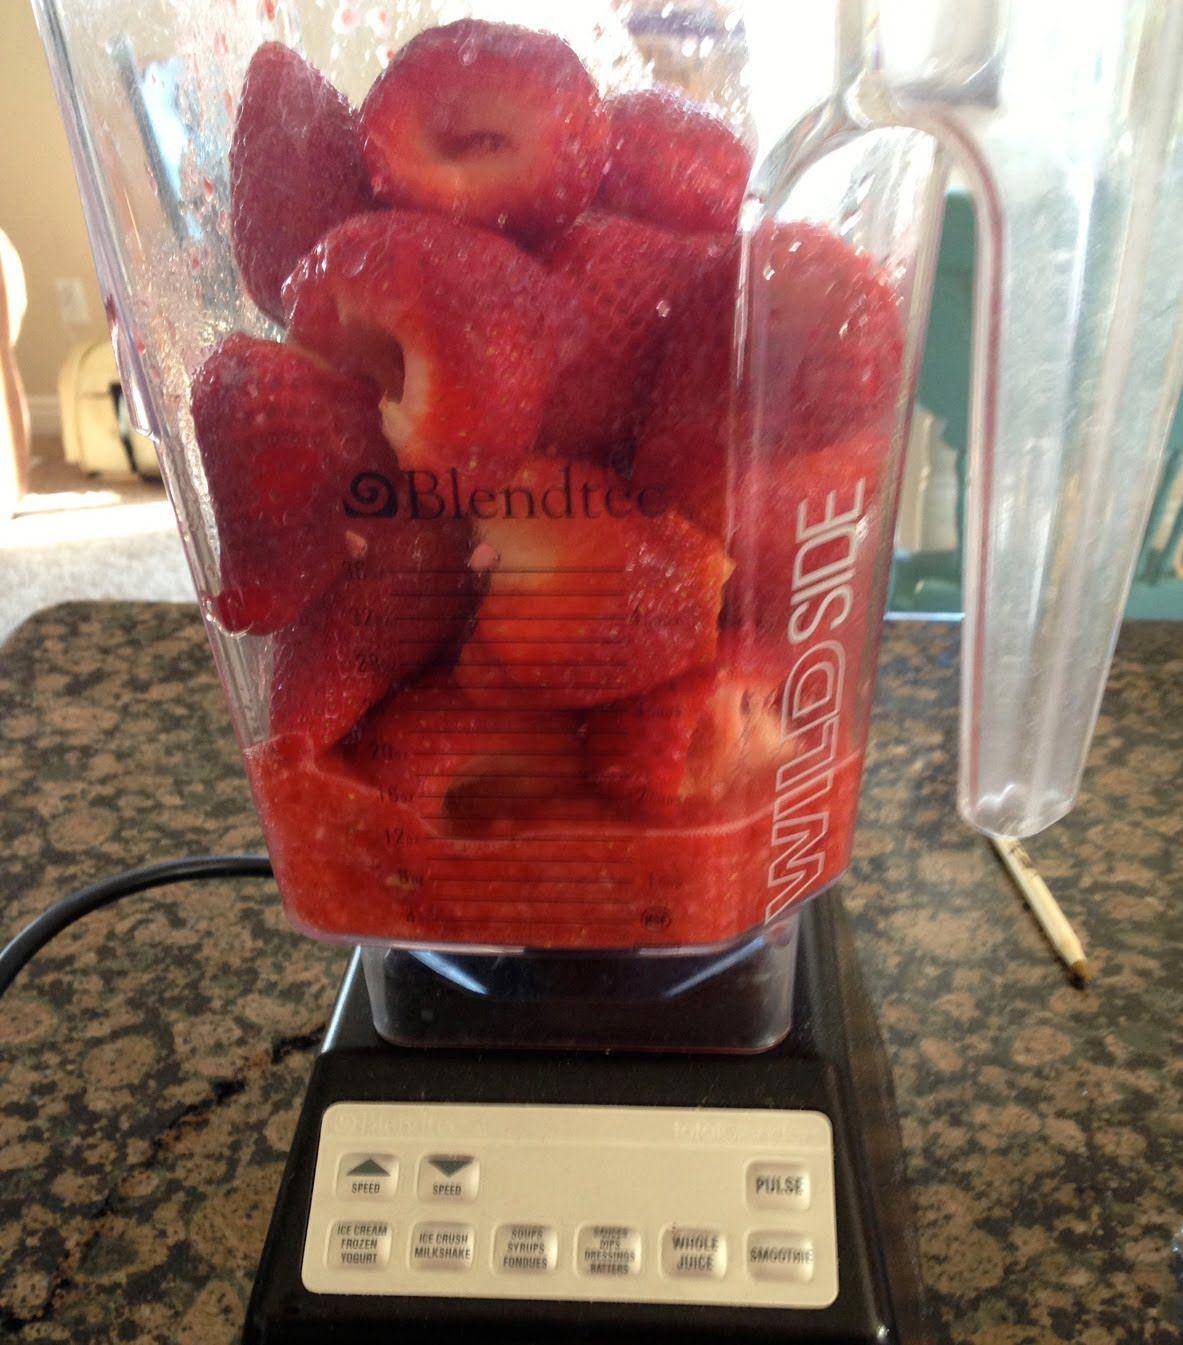 Blendtec strawberry freezer jam no cooking youtube